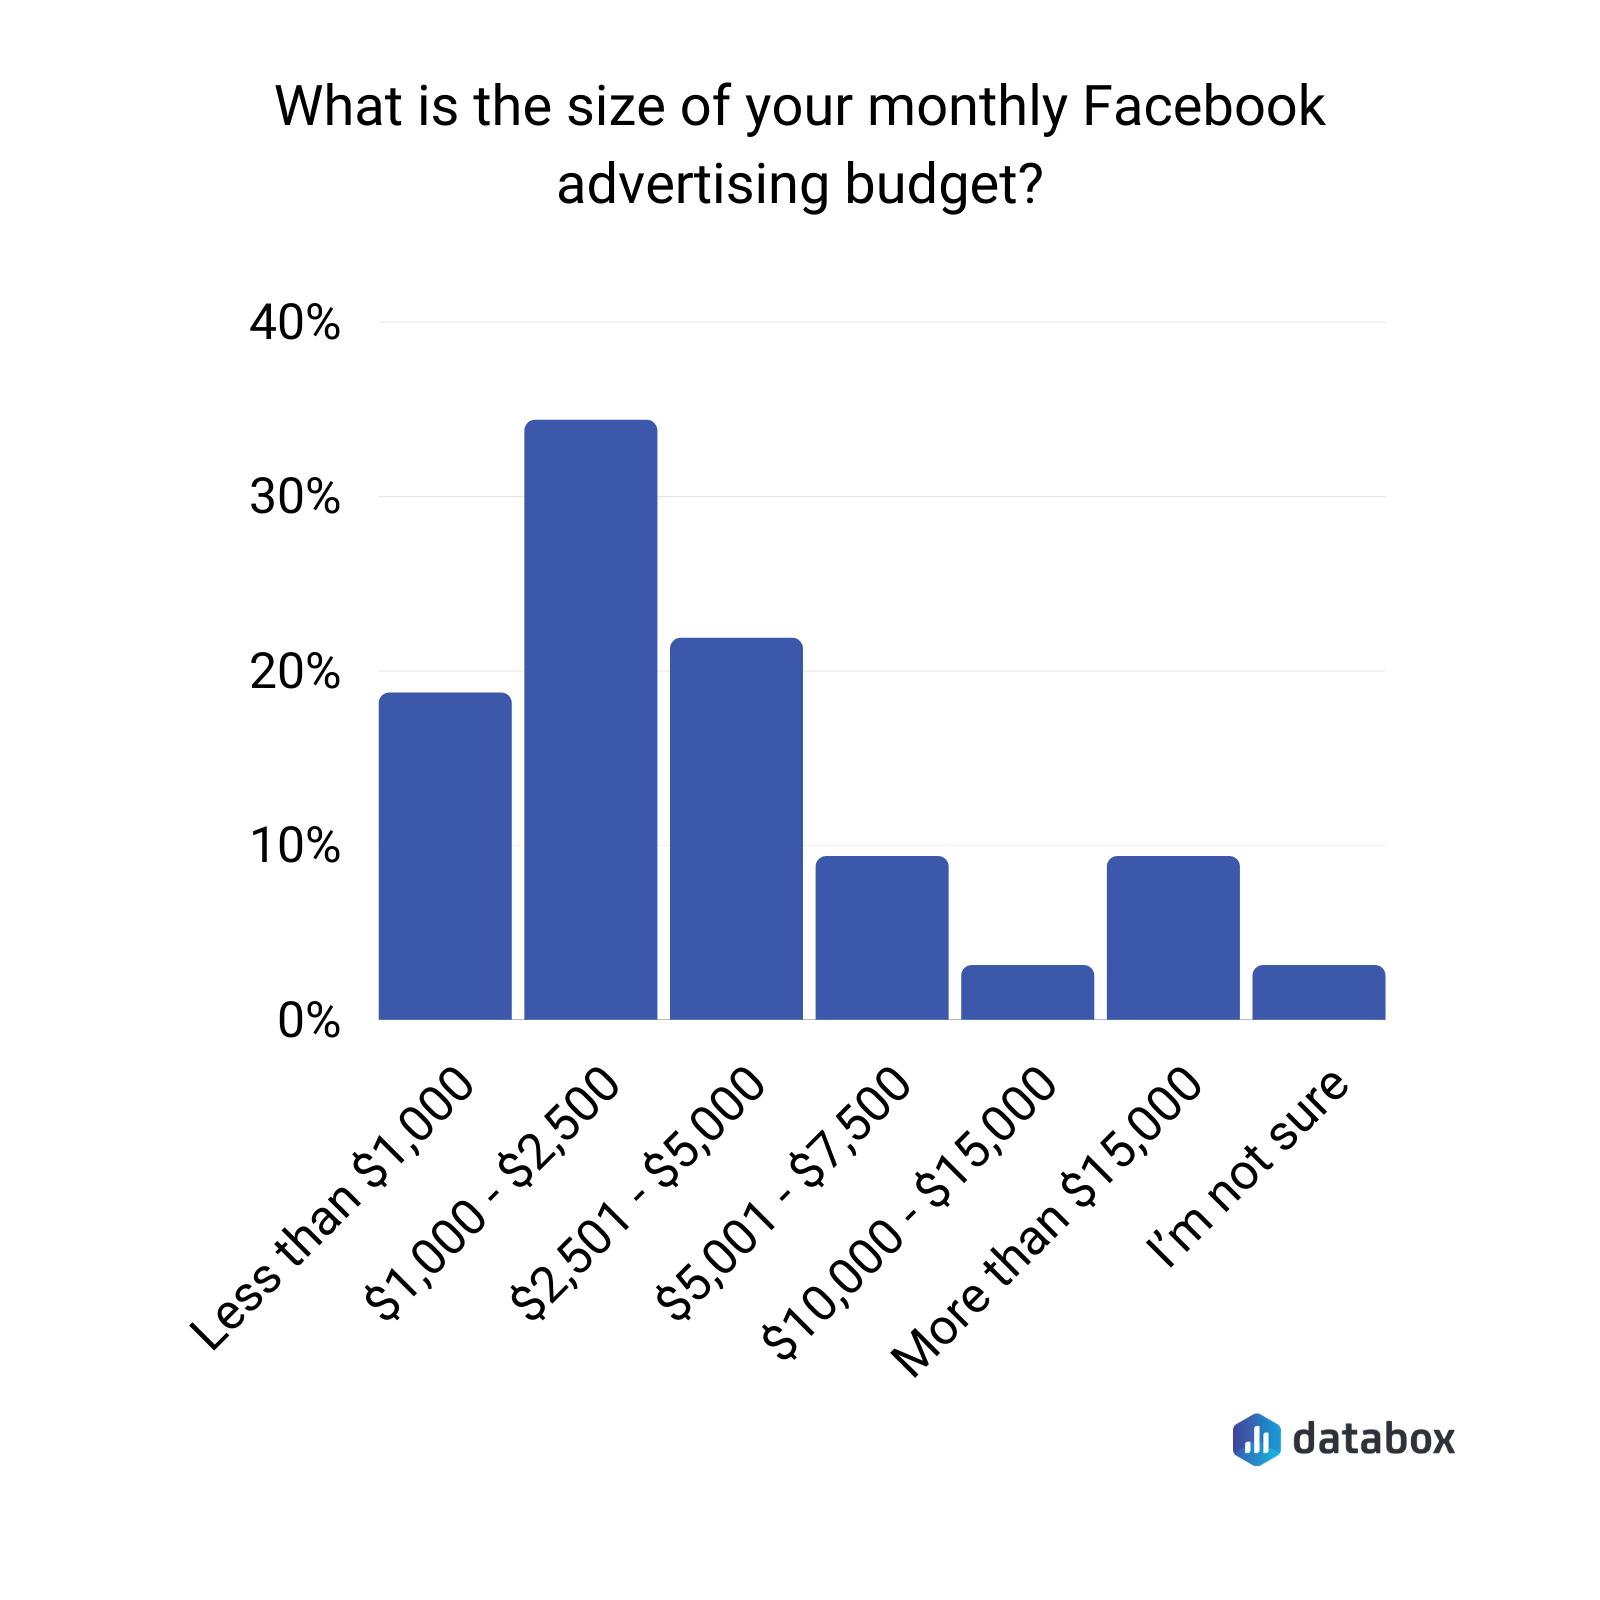 Average budget for Facebook advertising